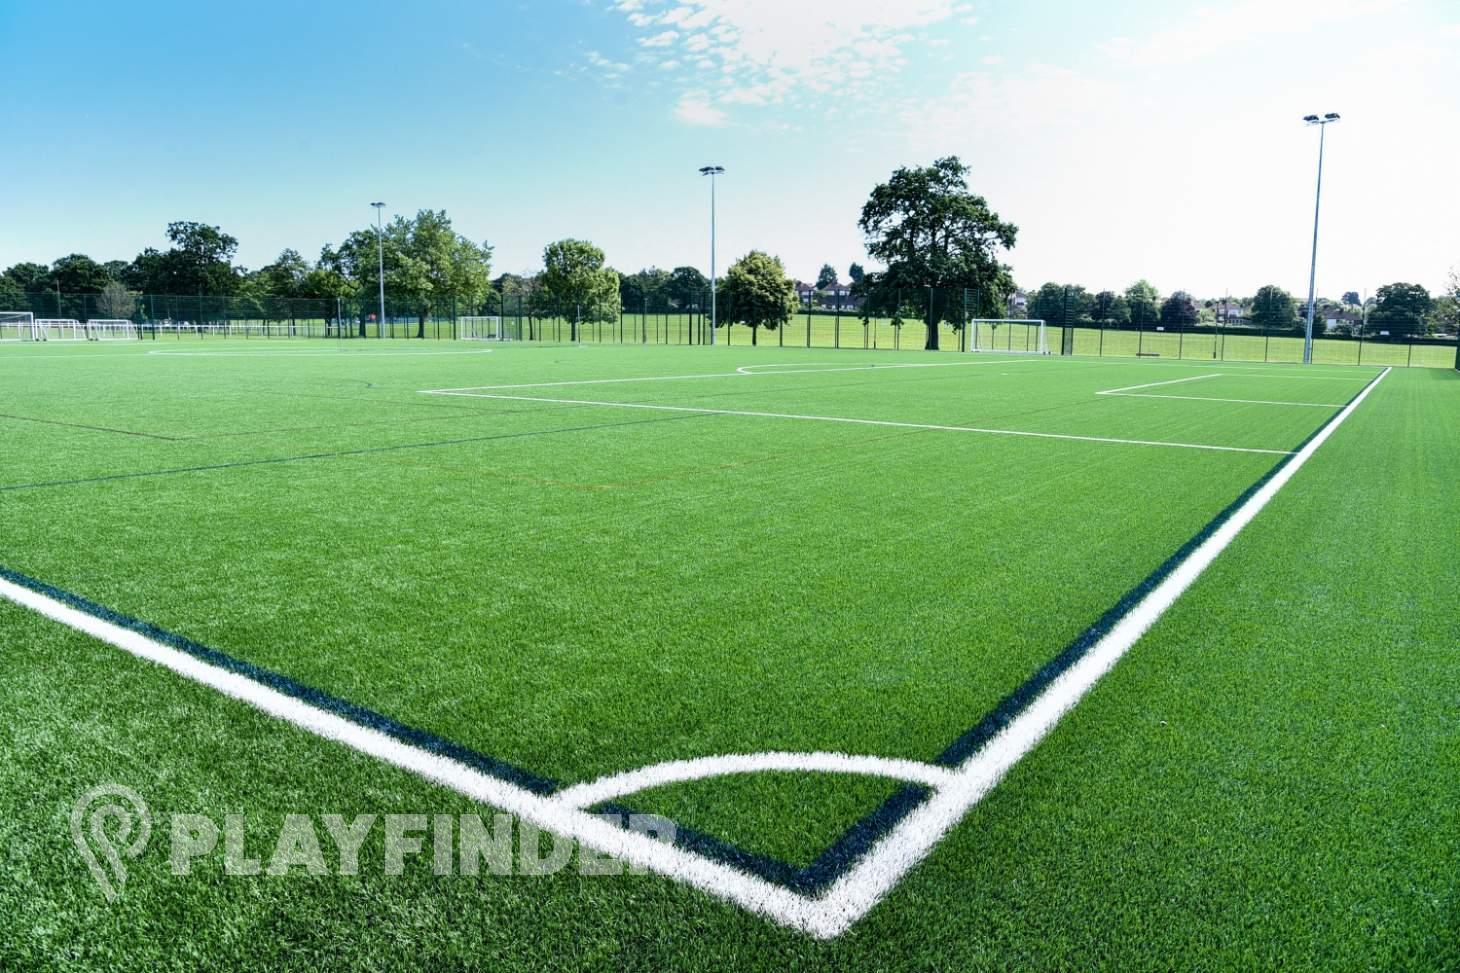 Barnet Lane 3G Pitch 11 a side | 3G Astroturf football pitch